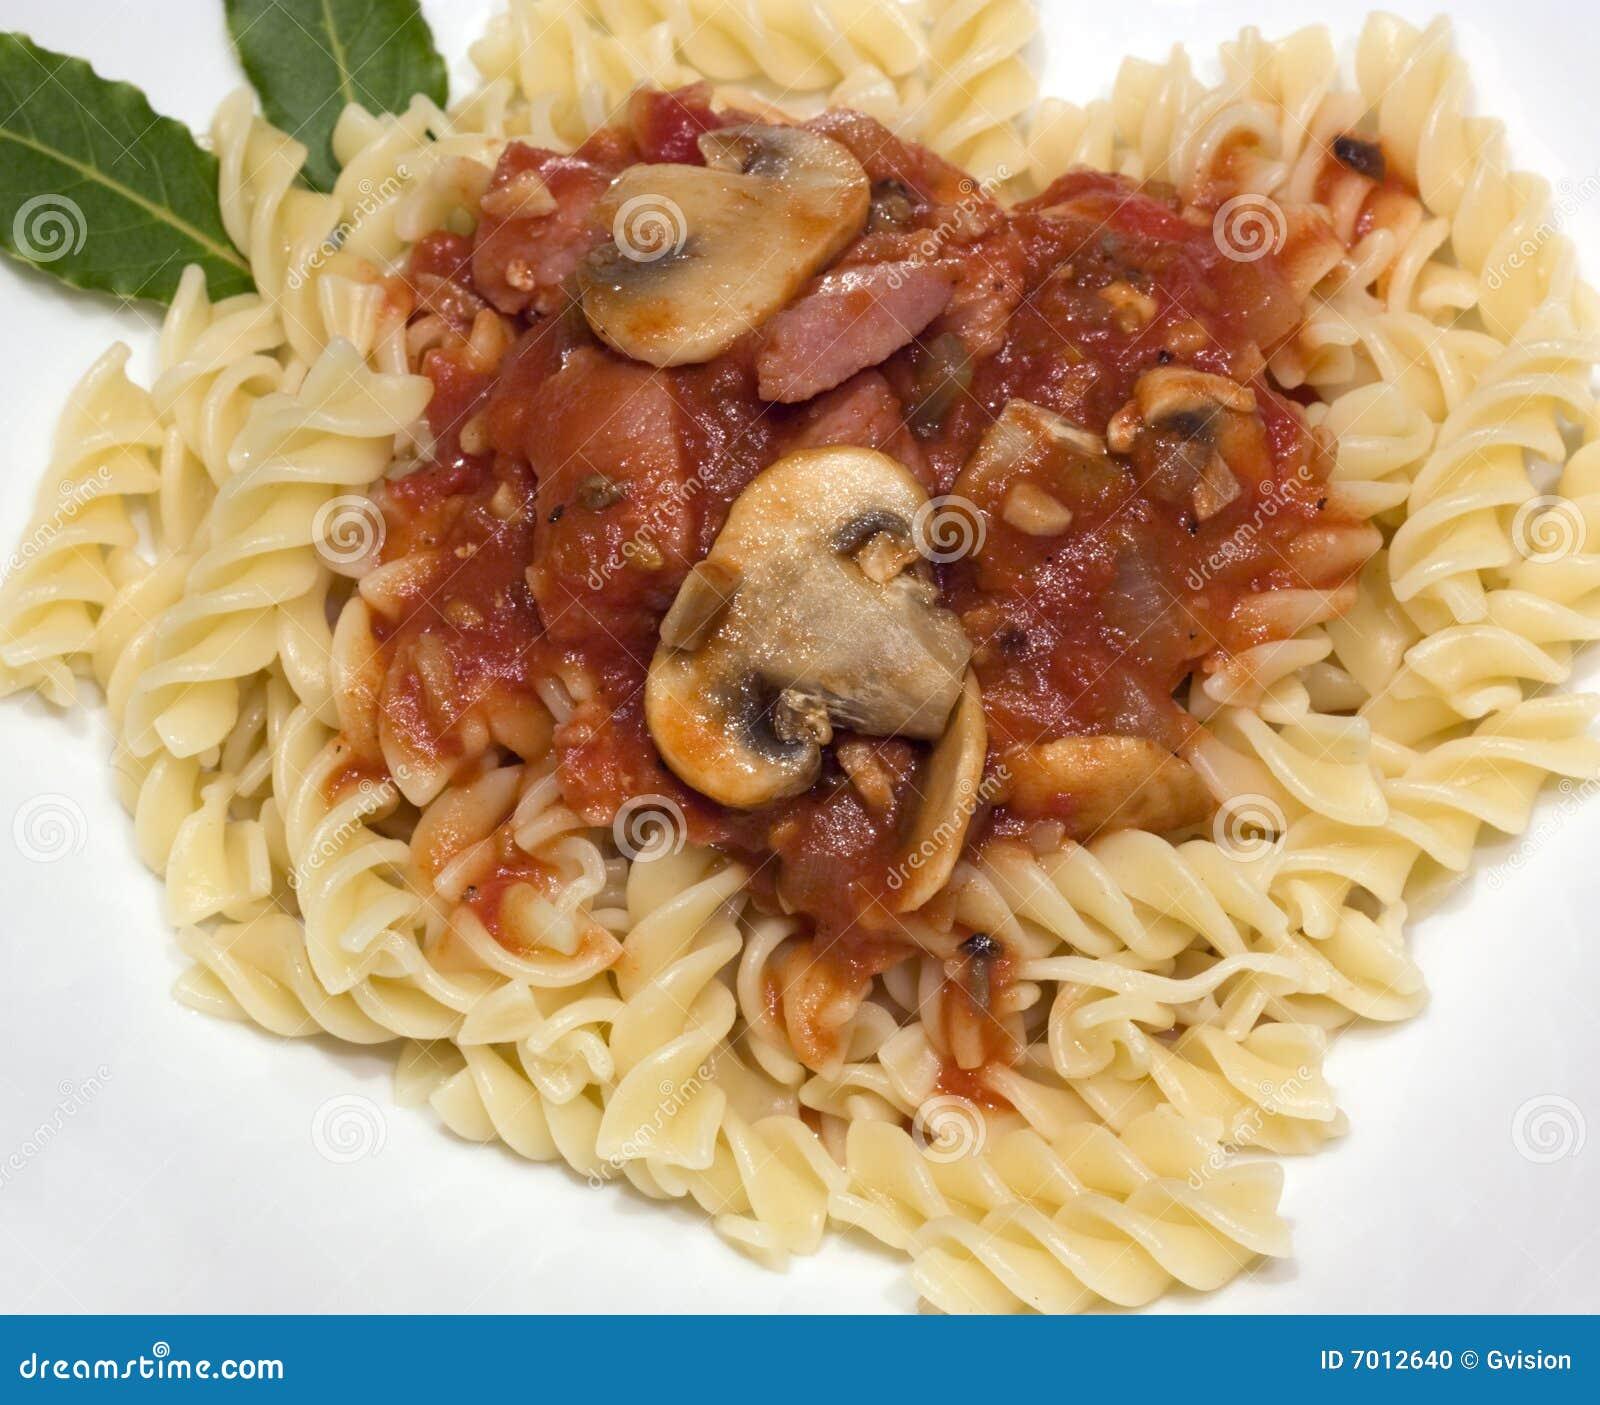 Fusilli pasta with mushrooms and bacon in tomato sauce.